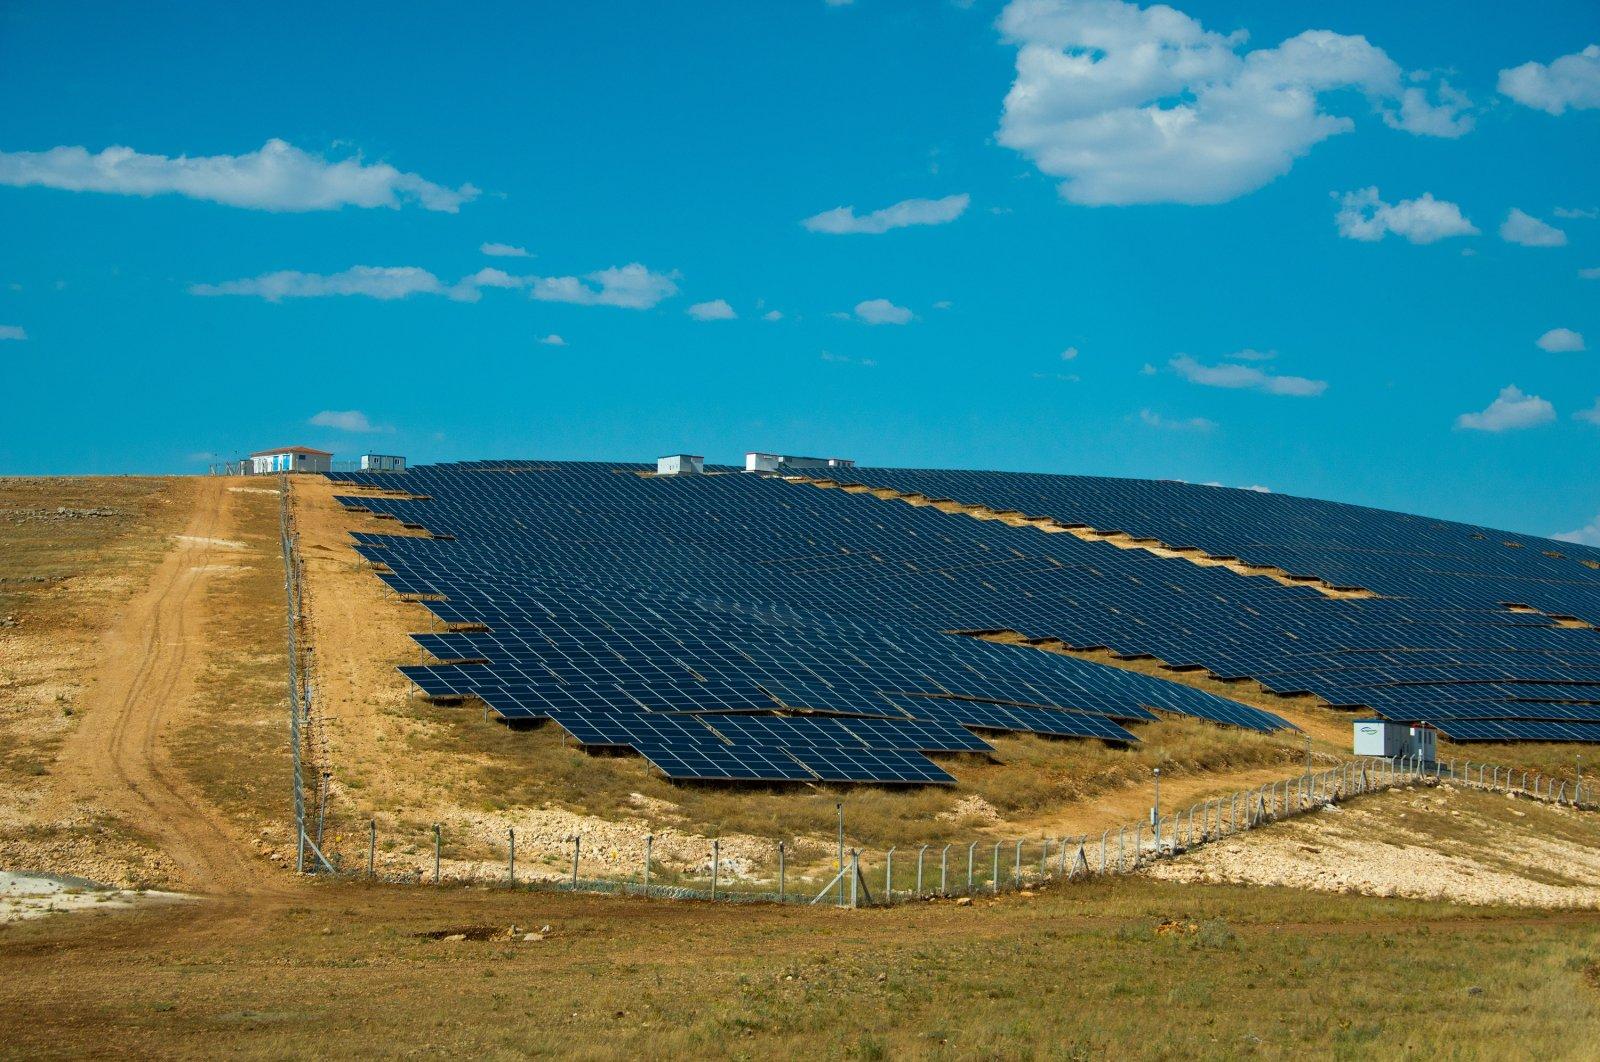 Solar panels at a photovoltaic solar power plant in southeastern Şanlıurfa province, Turkey. (Shutterstock Photo)